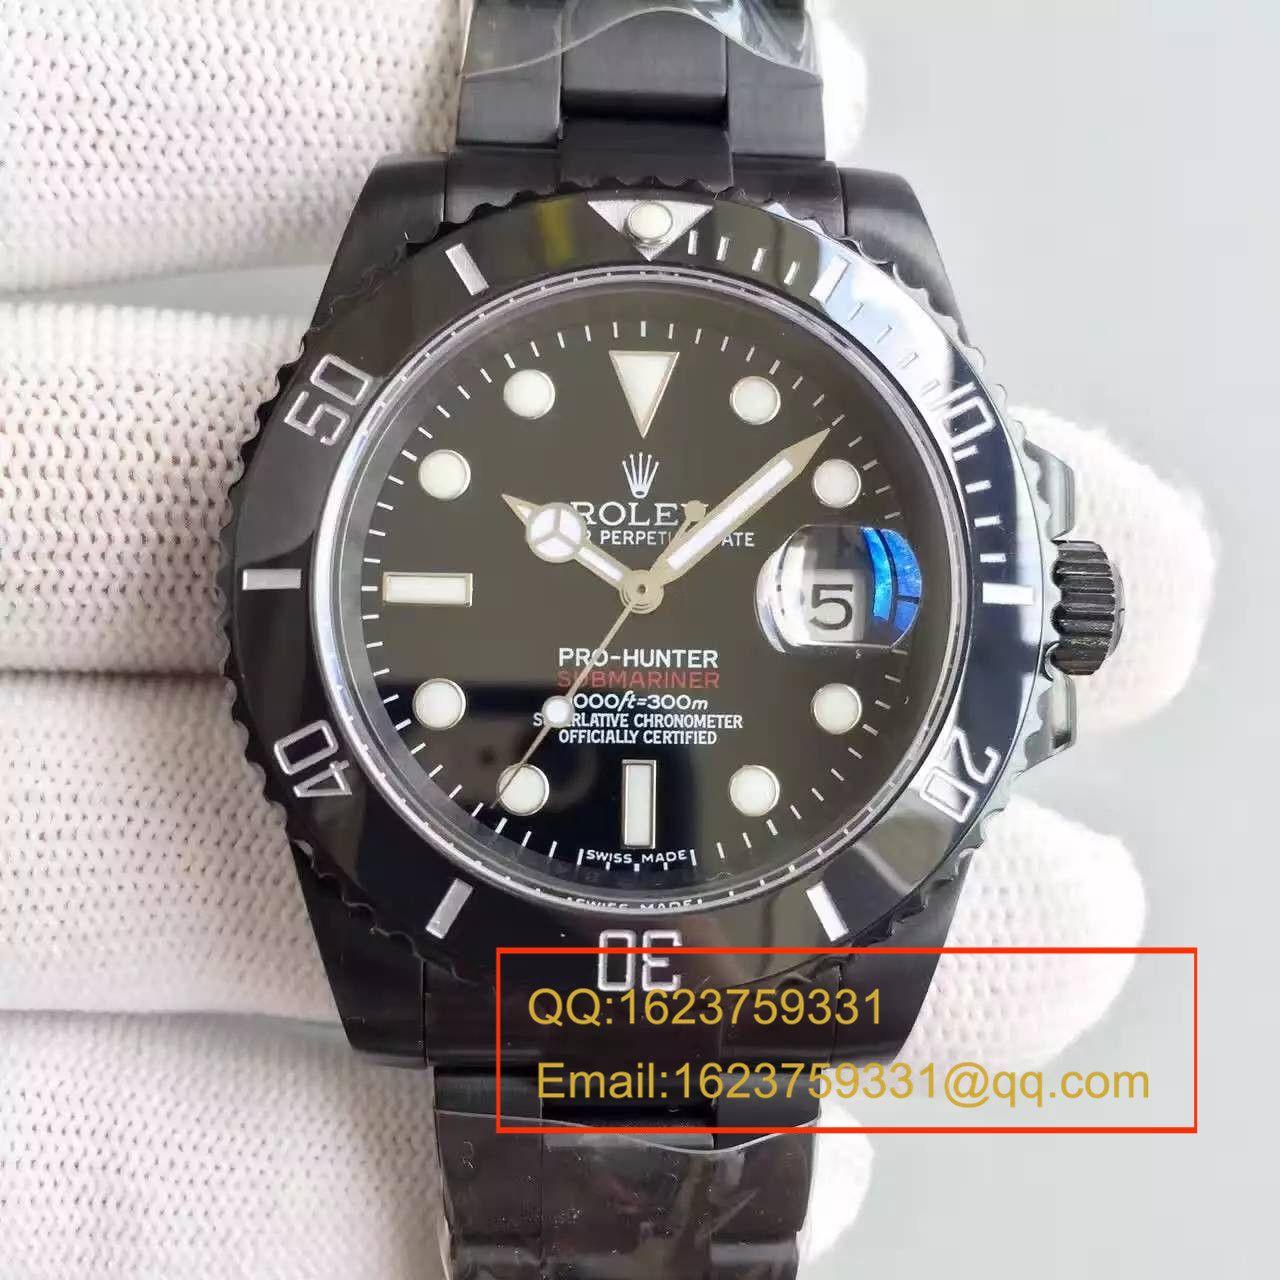 【SF厂精品】劳力士Rolex经典款Submariner,PVD特别版 1:1 超级版 / R059